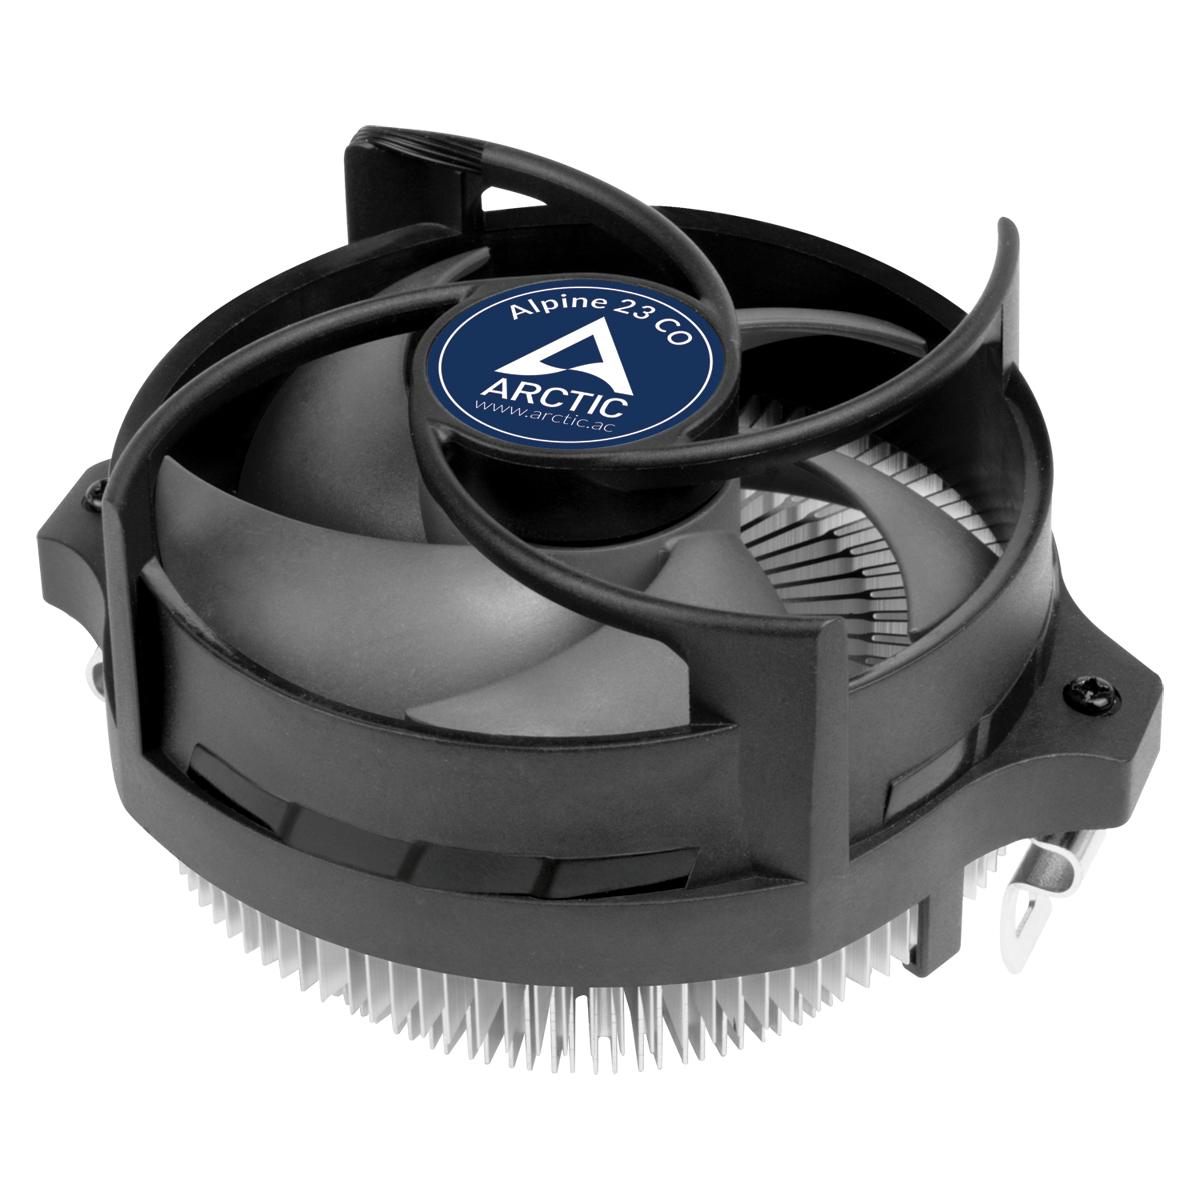 Arctic Kühler Alpine 23 CO AMD4/AMD3+/AMD2+/FM2/FM1 - CPU-Kühler - AMD Sockel AM2